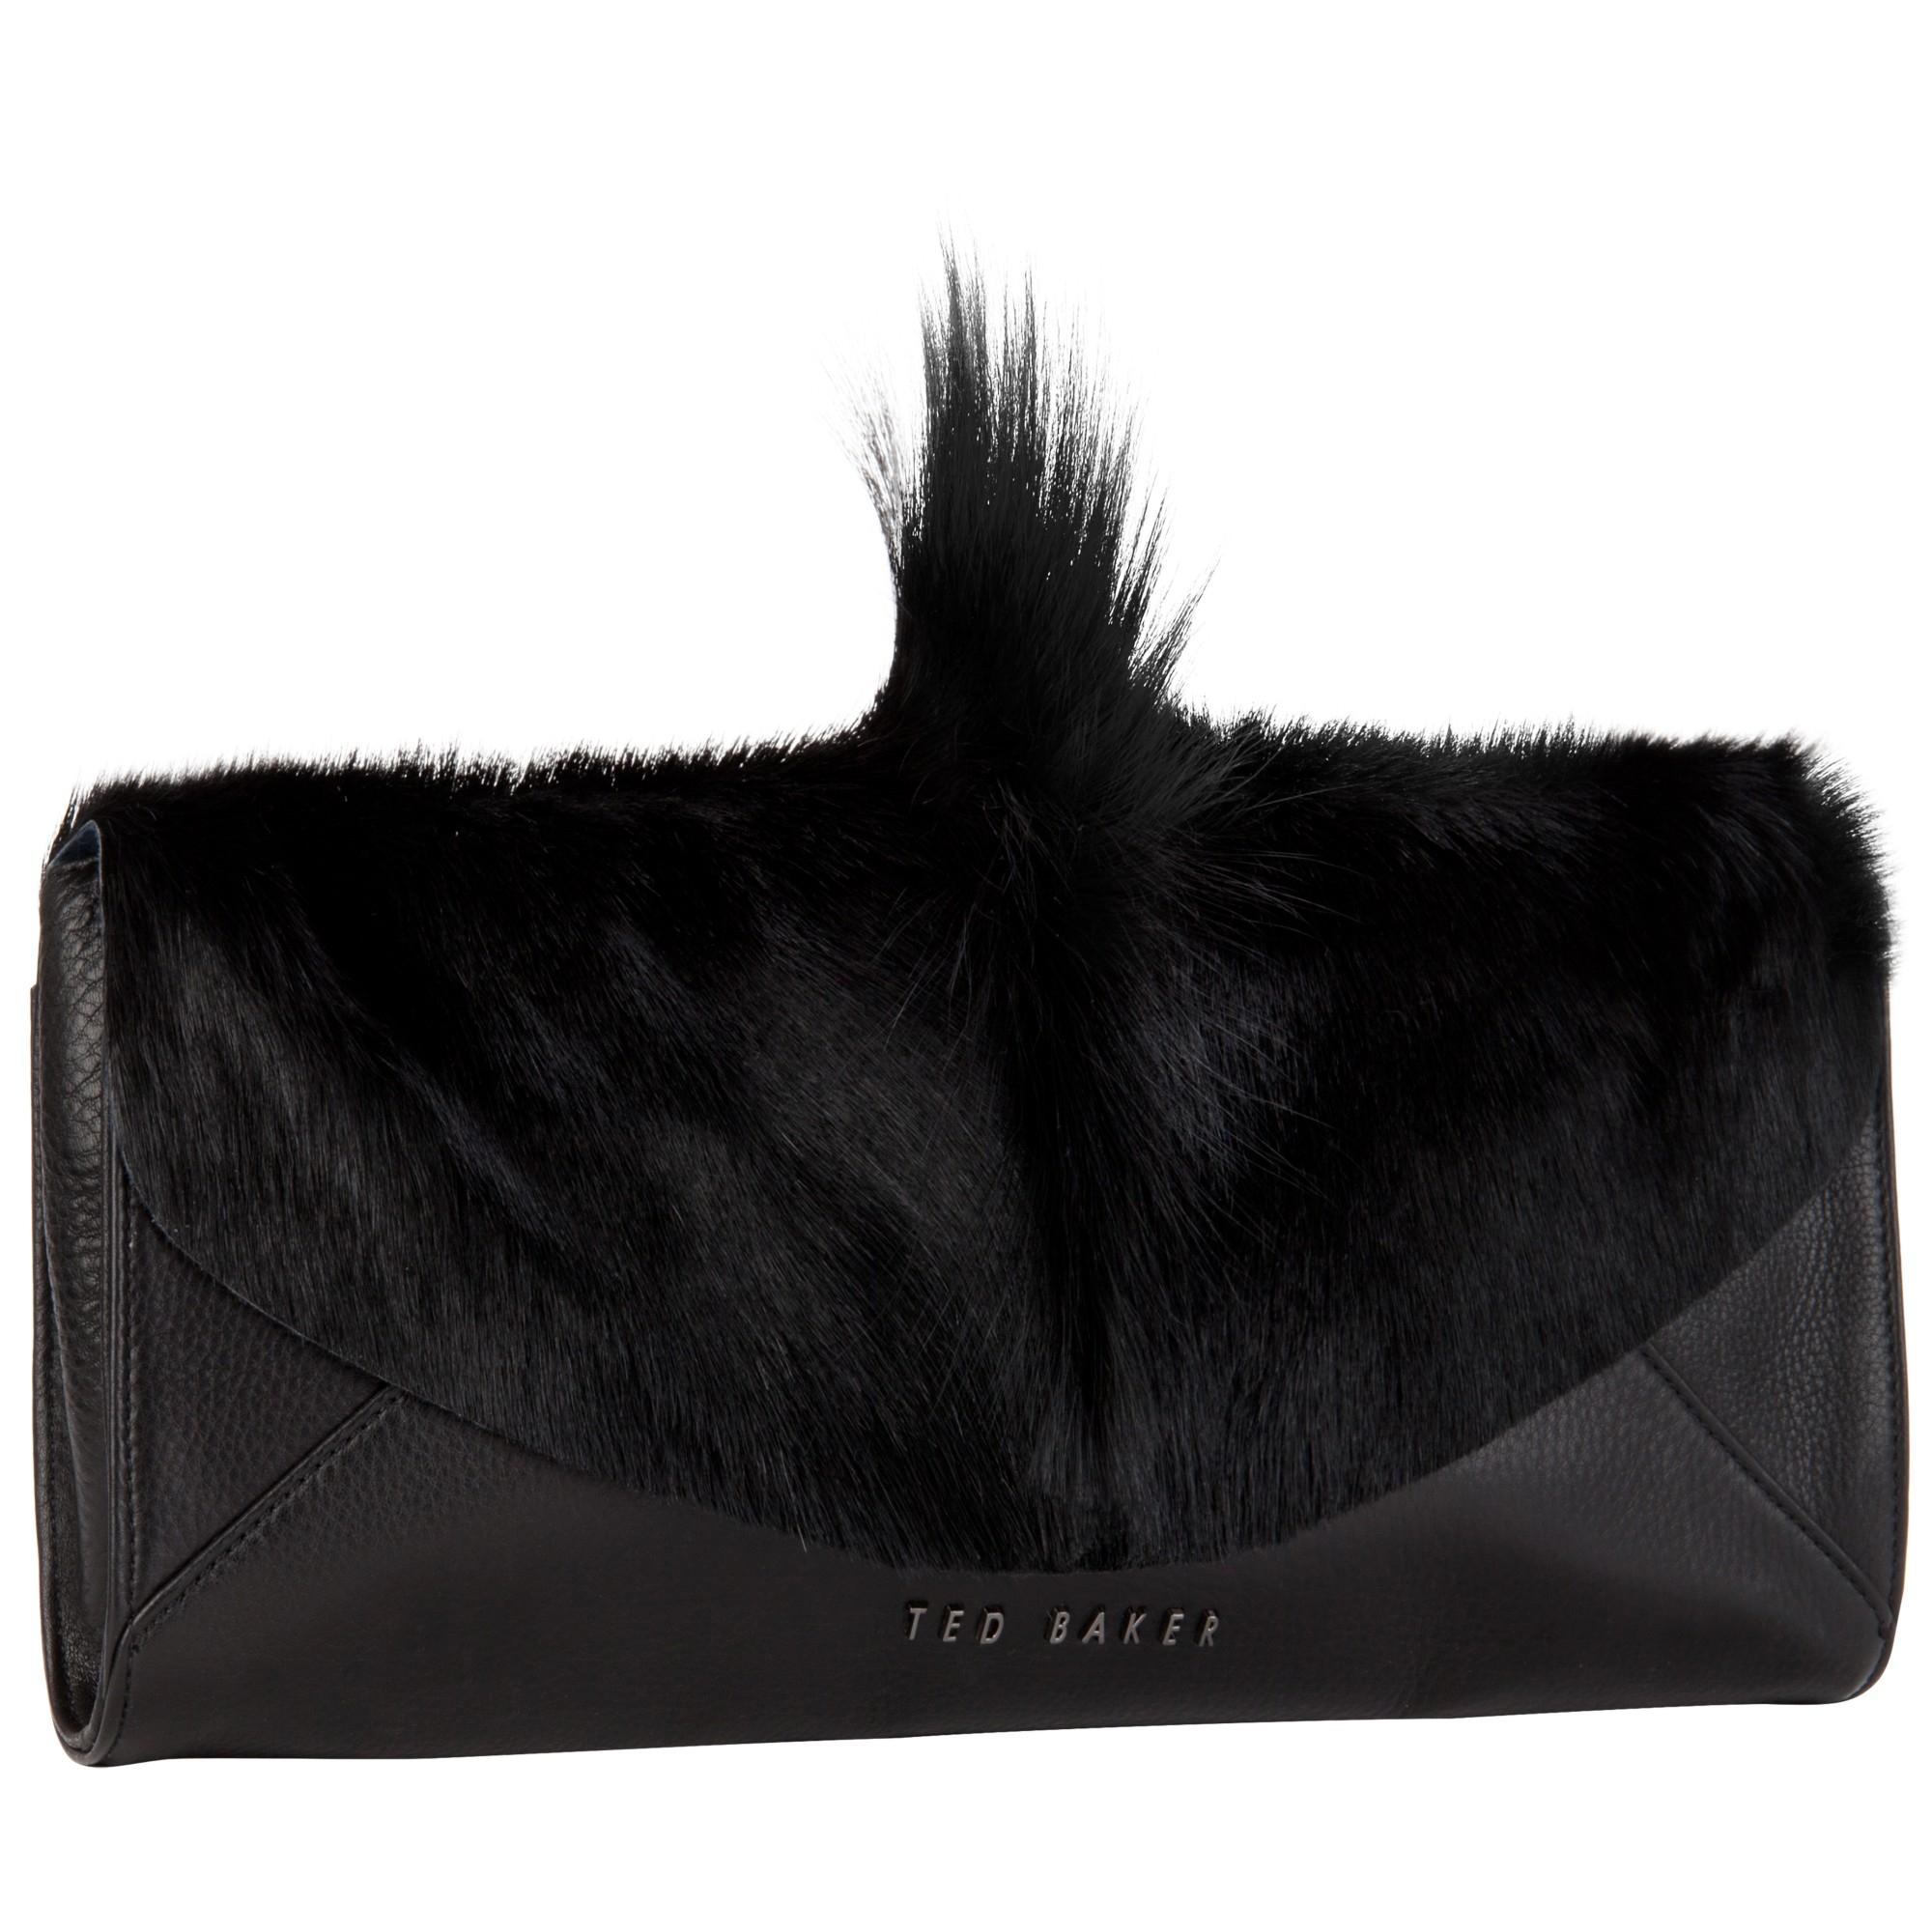 96d851014643b Ted Baker Moti Springbok Leather Clutch Bag in Black - Lyst